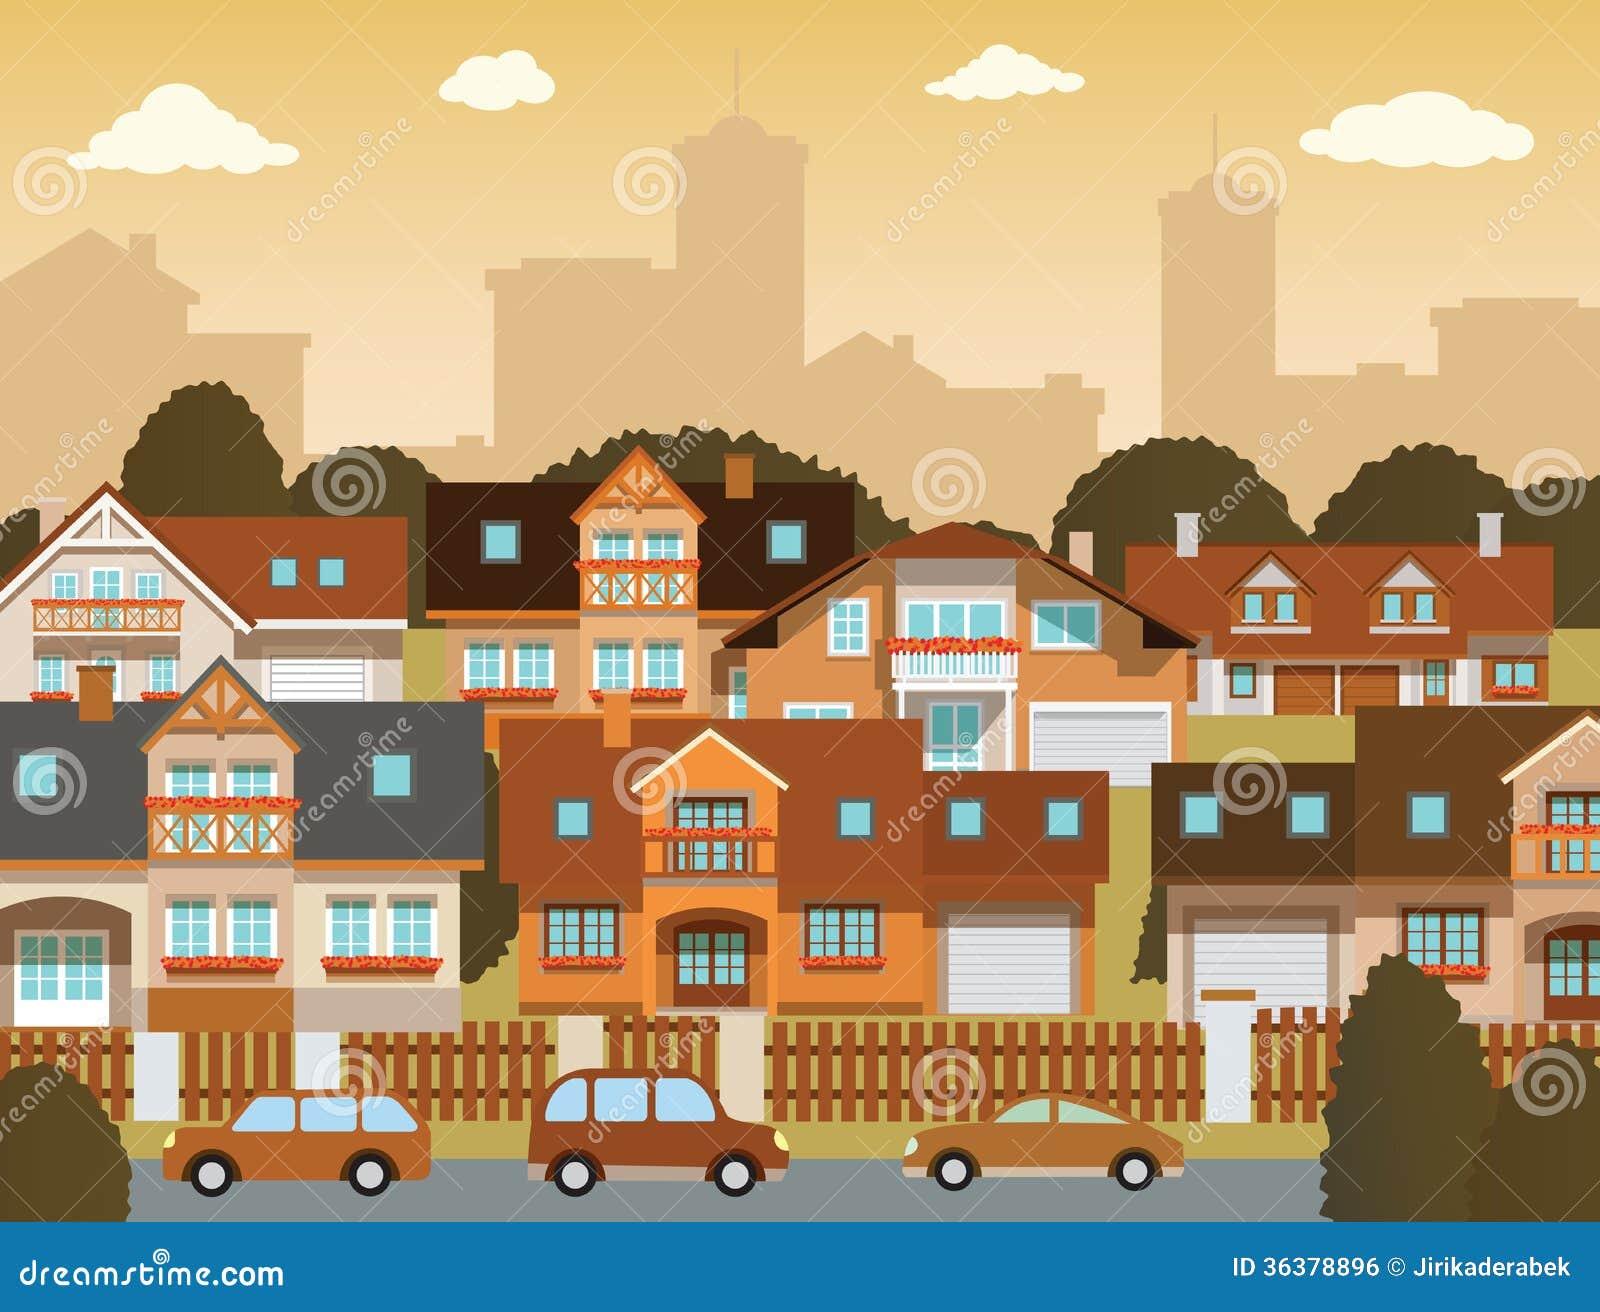 Suburban Houses Royalty Free Stock Image Image 36378896